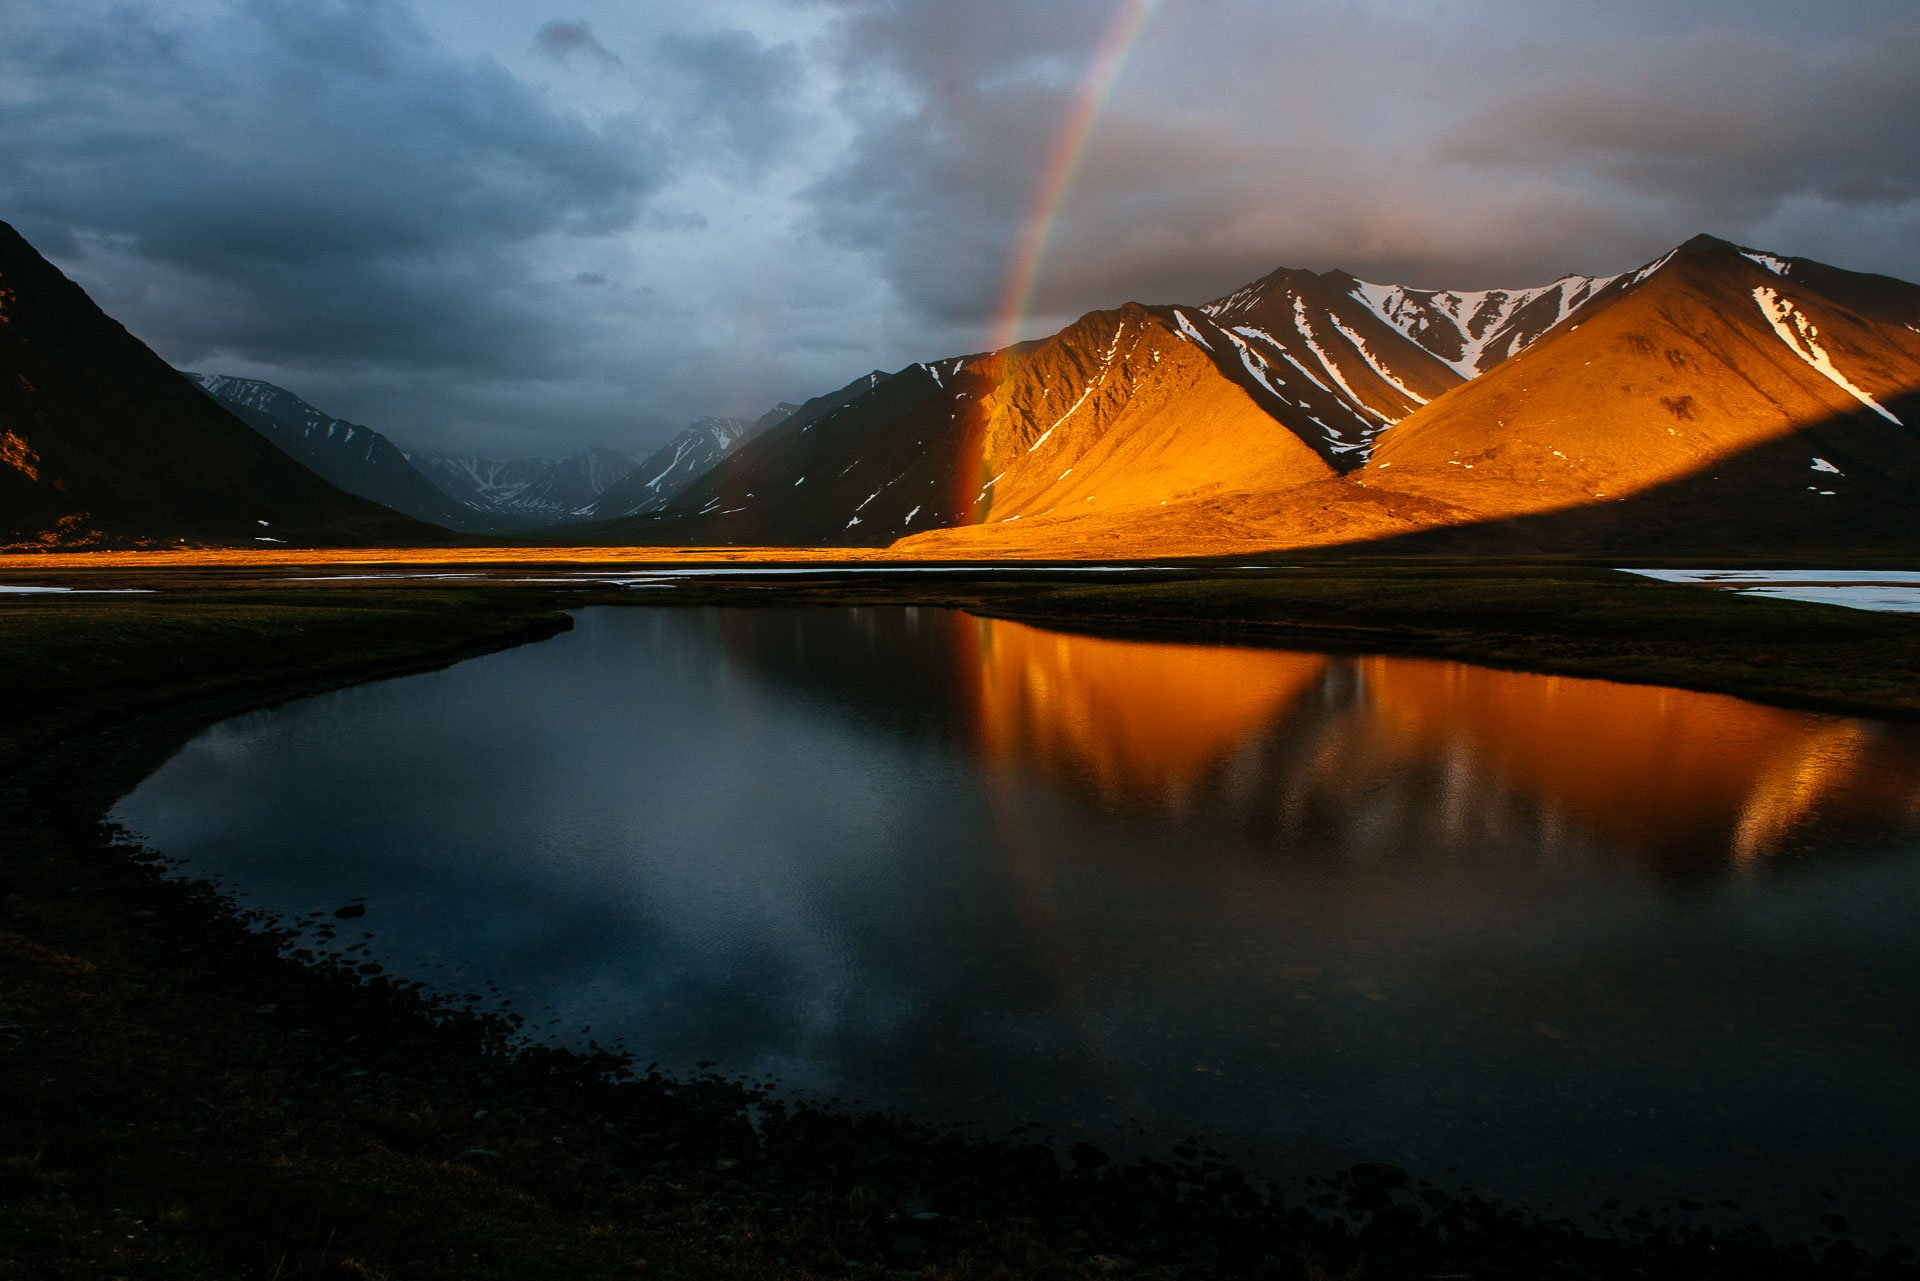 озеро, раучувагытгын, Иван Кислов